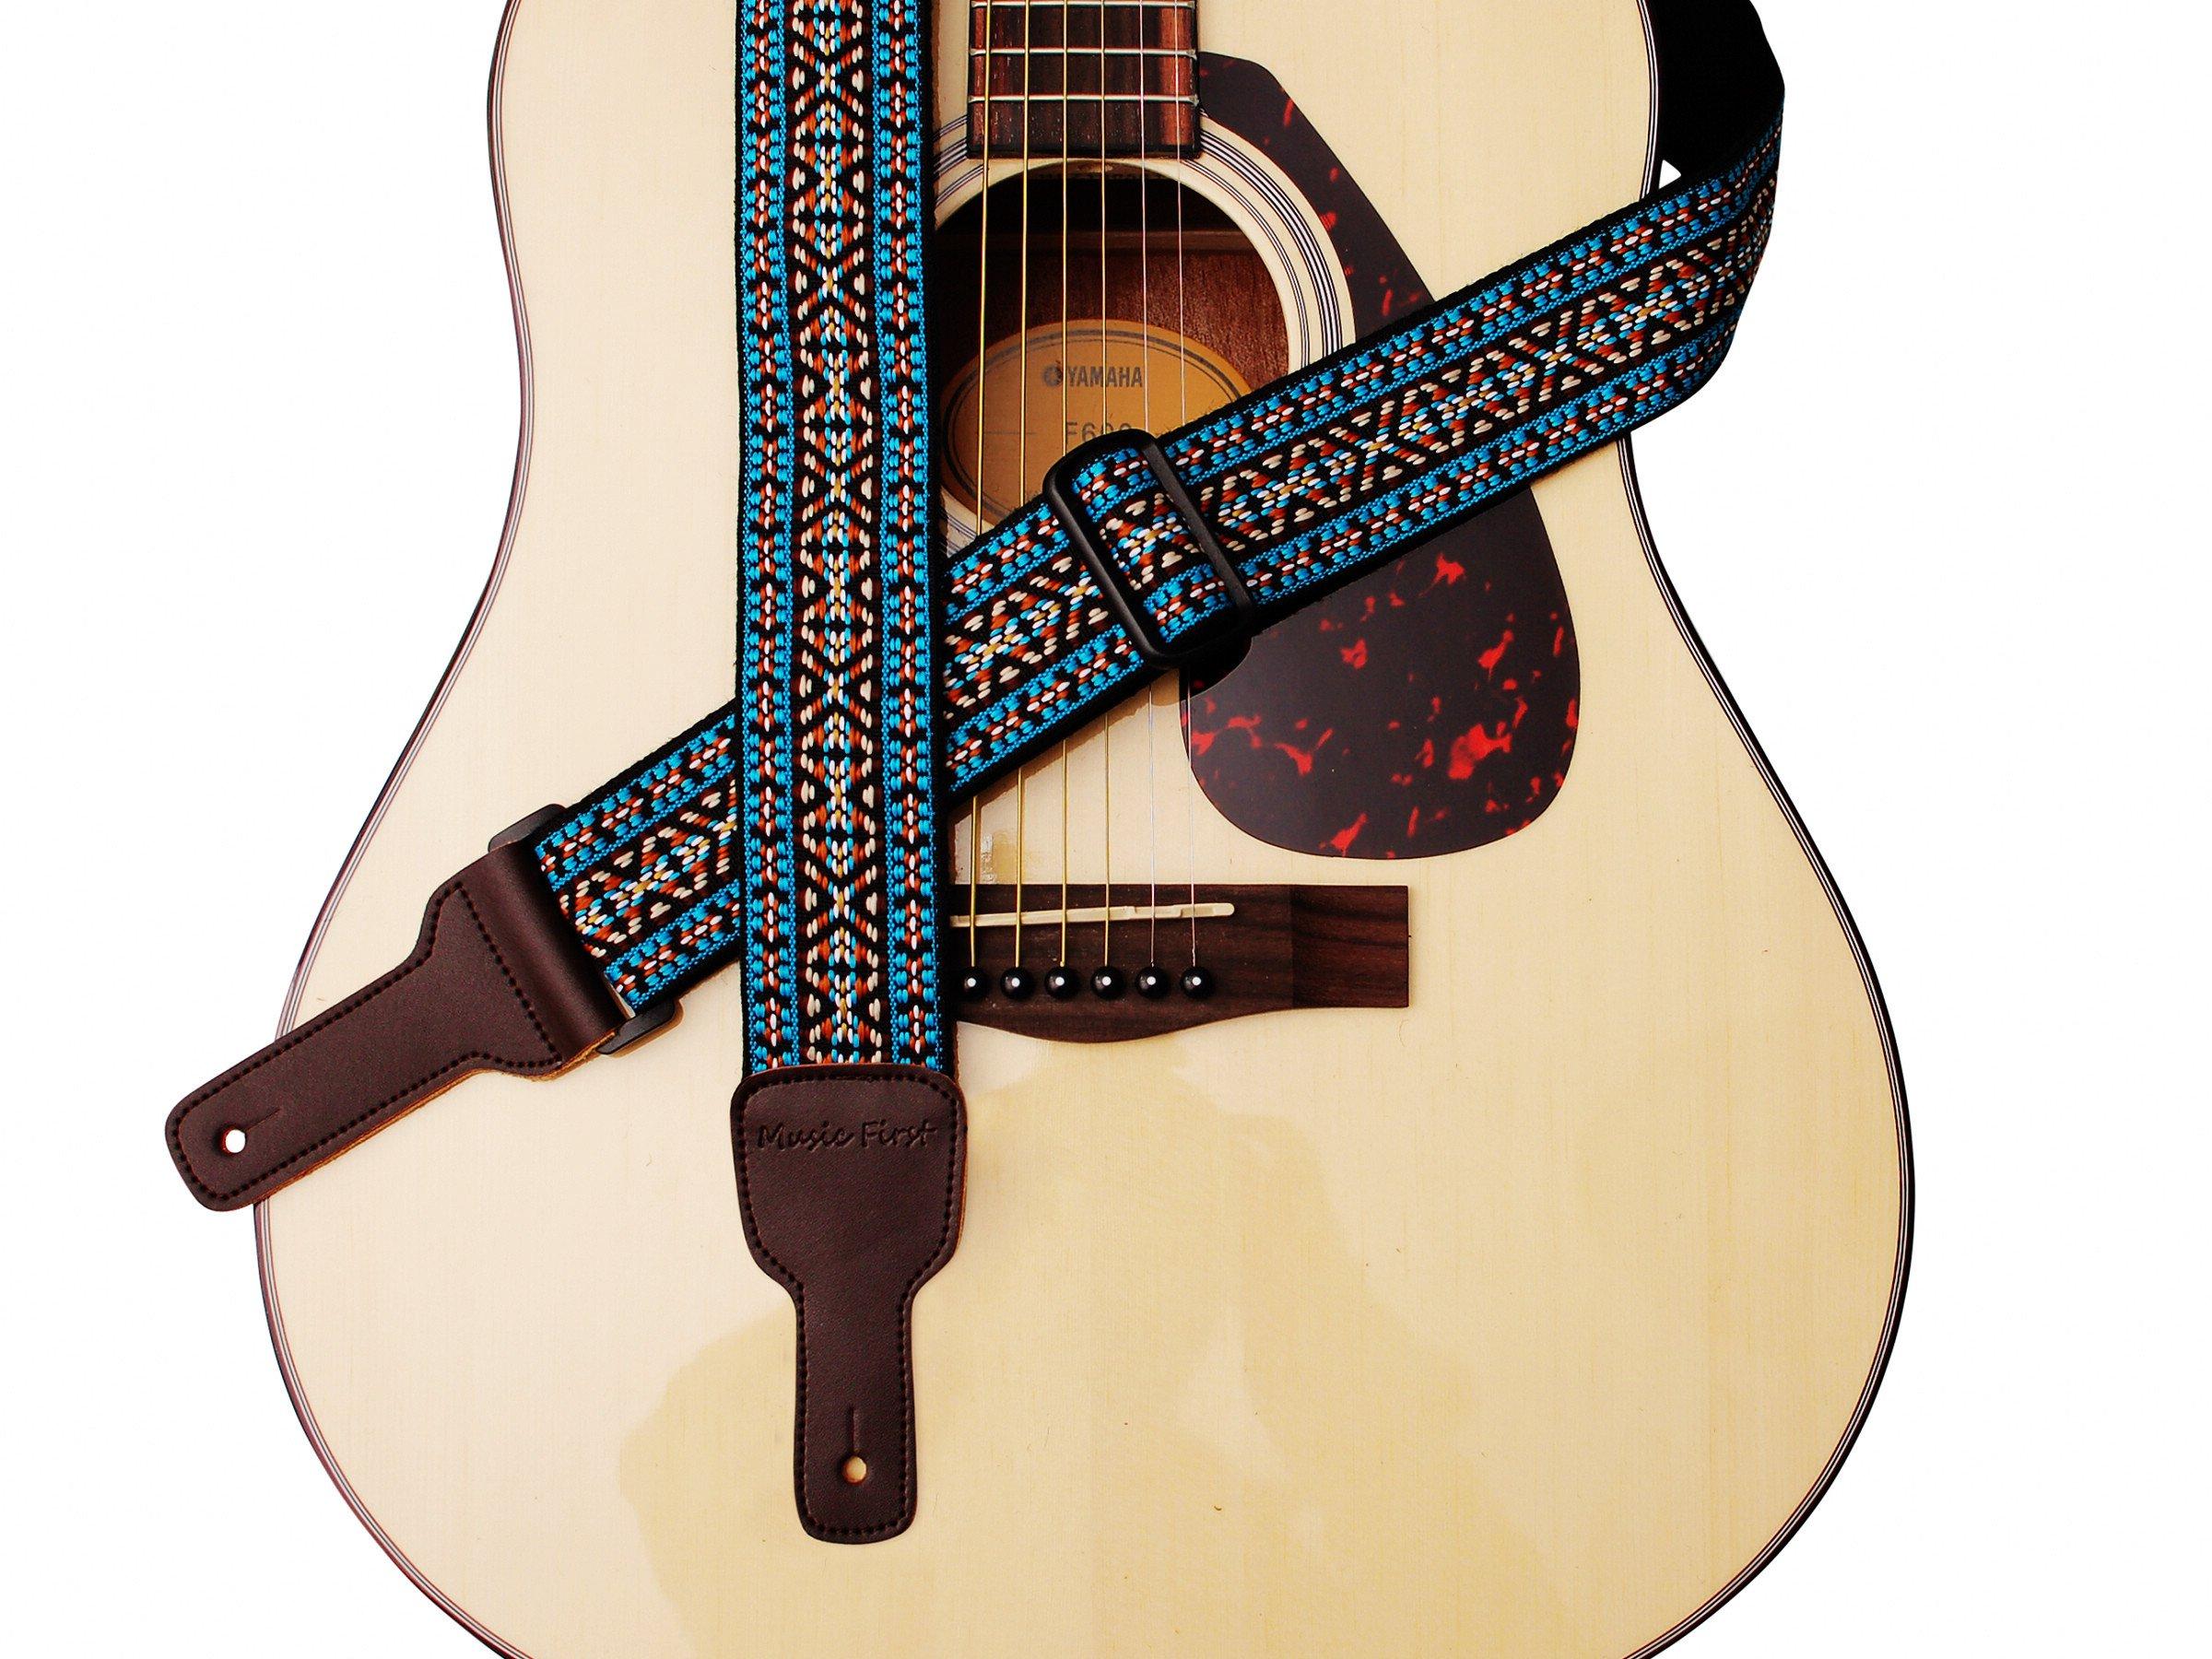 MUSIC FIRST Original Design Country style Soft Cotton & Genuine Leather Guitar Strap, Banjo Strap